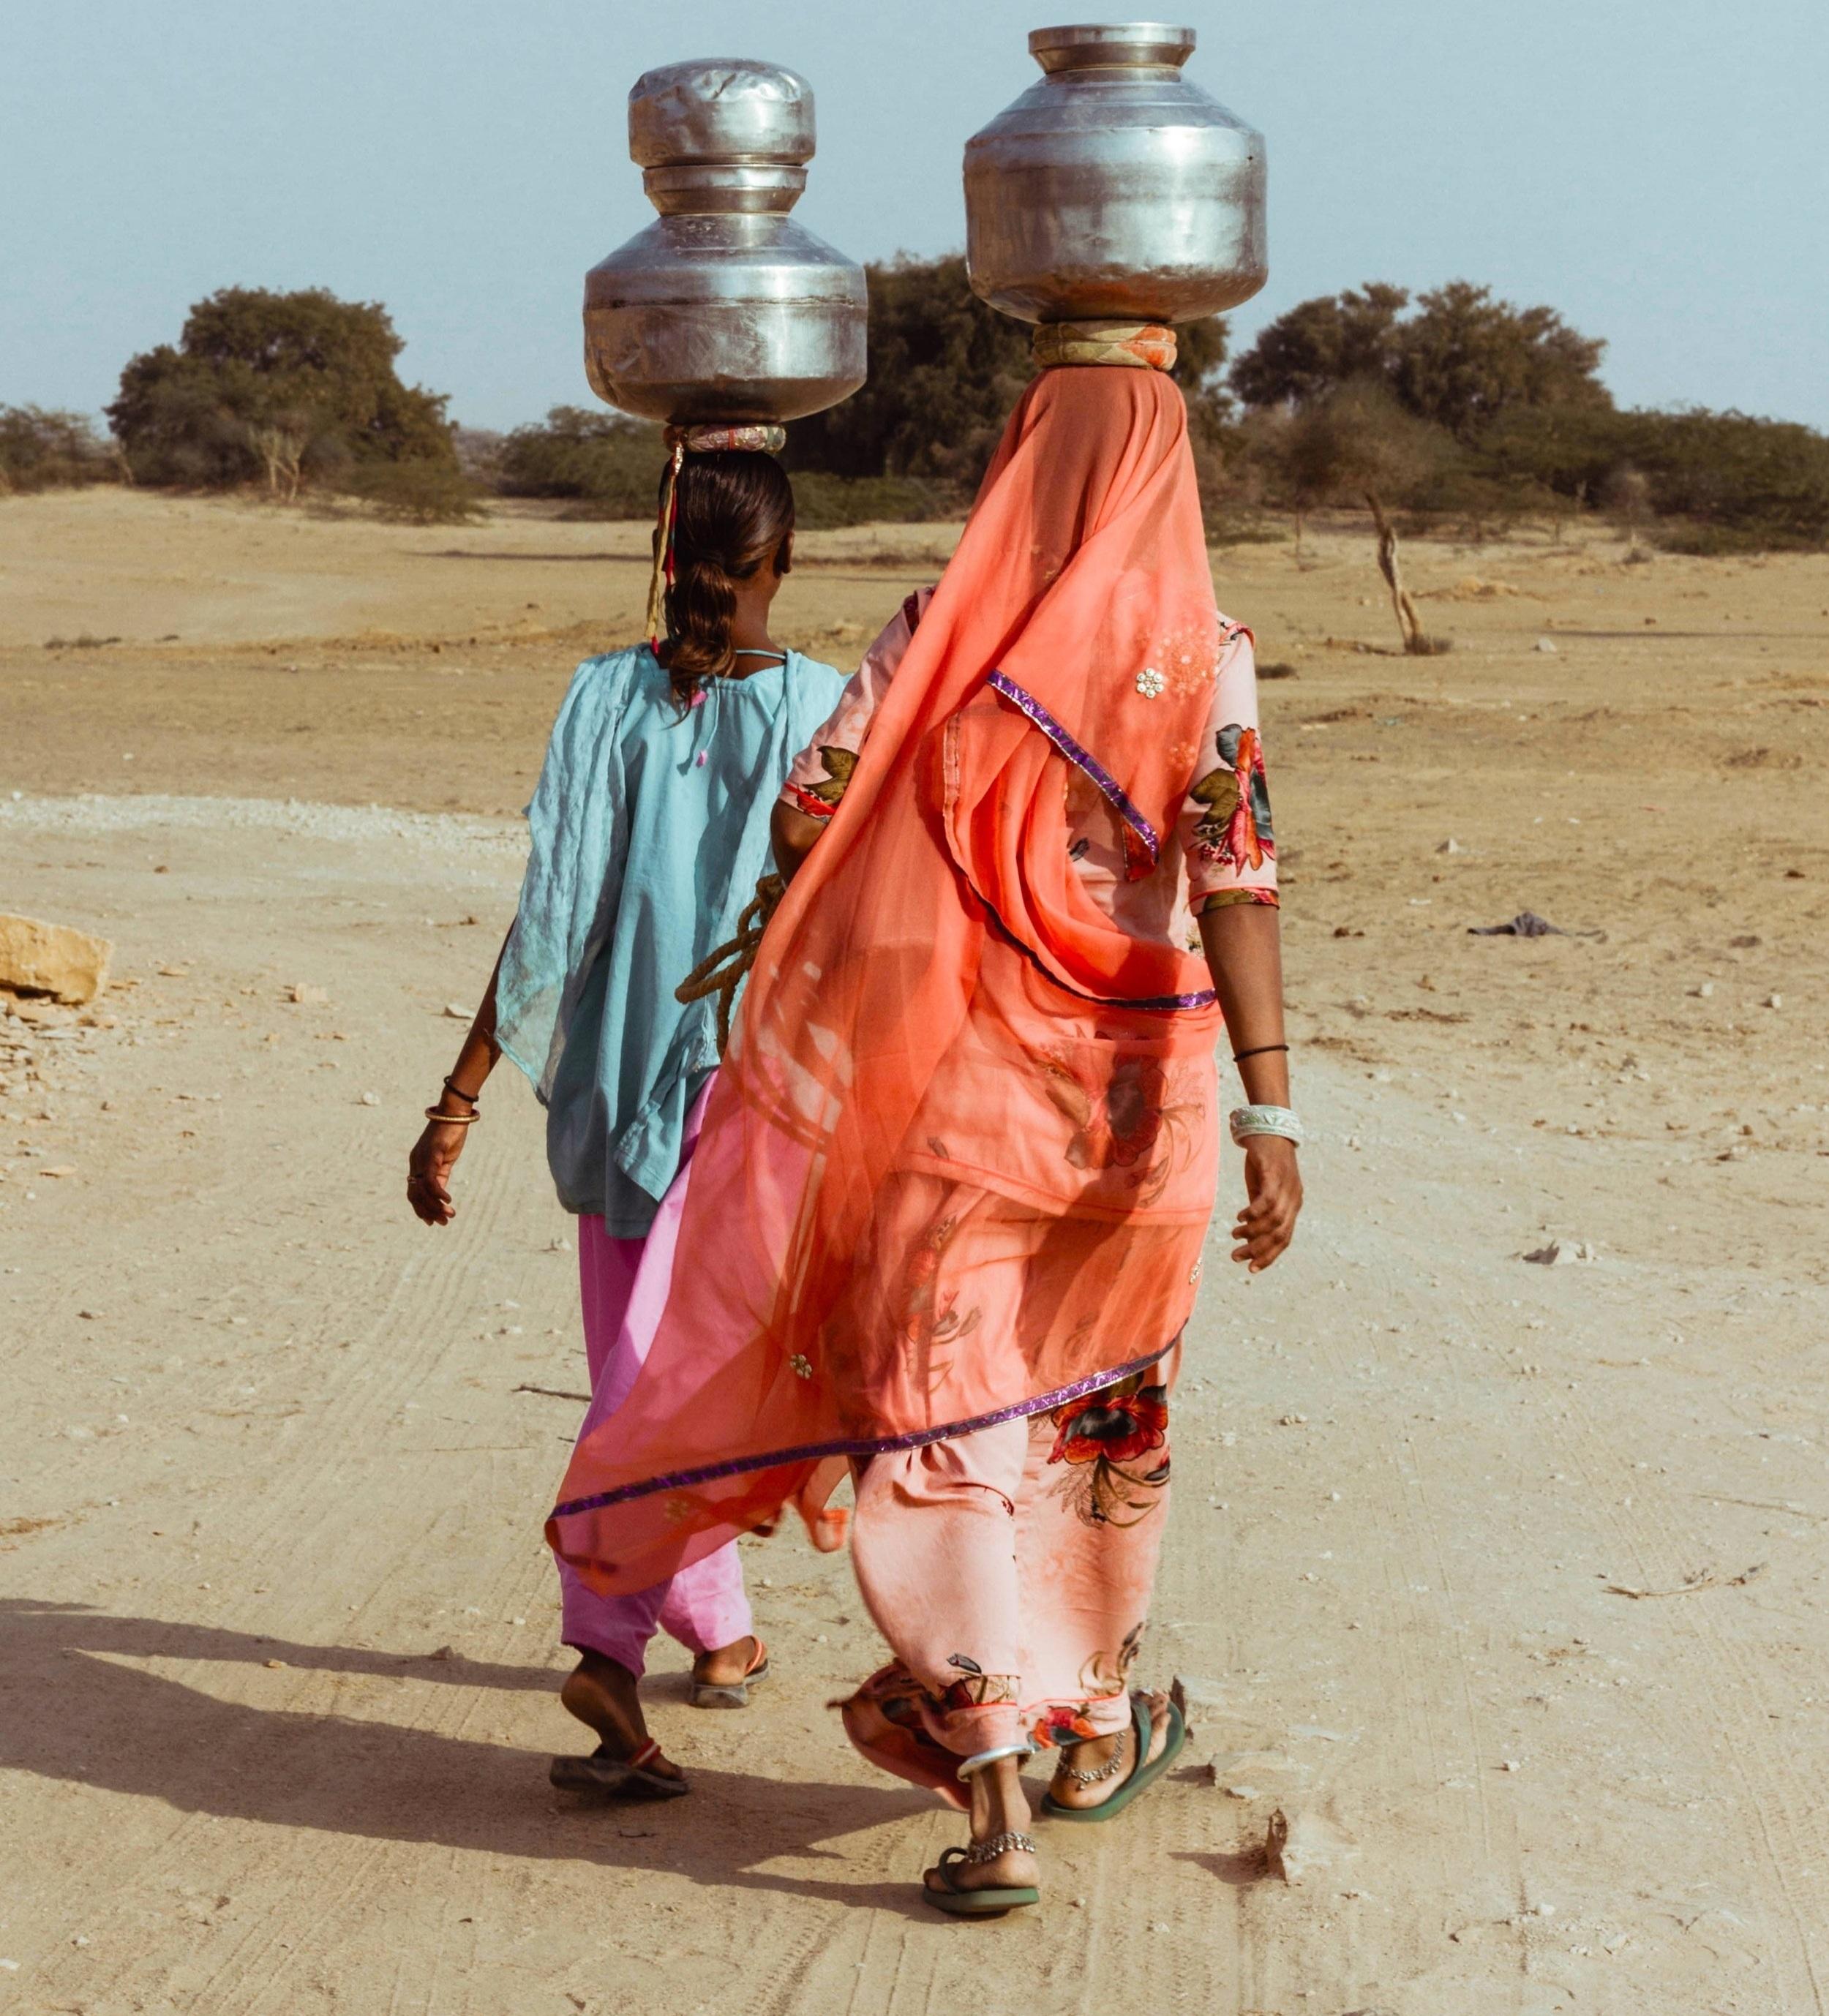 Rajasthani women carrying water pots